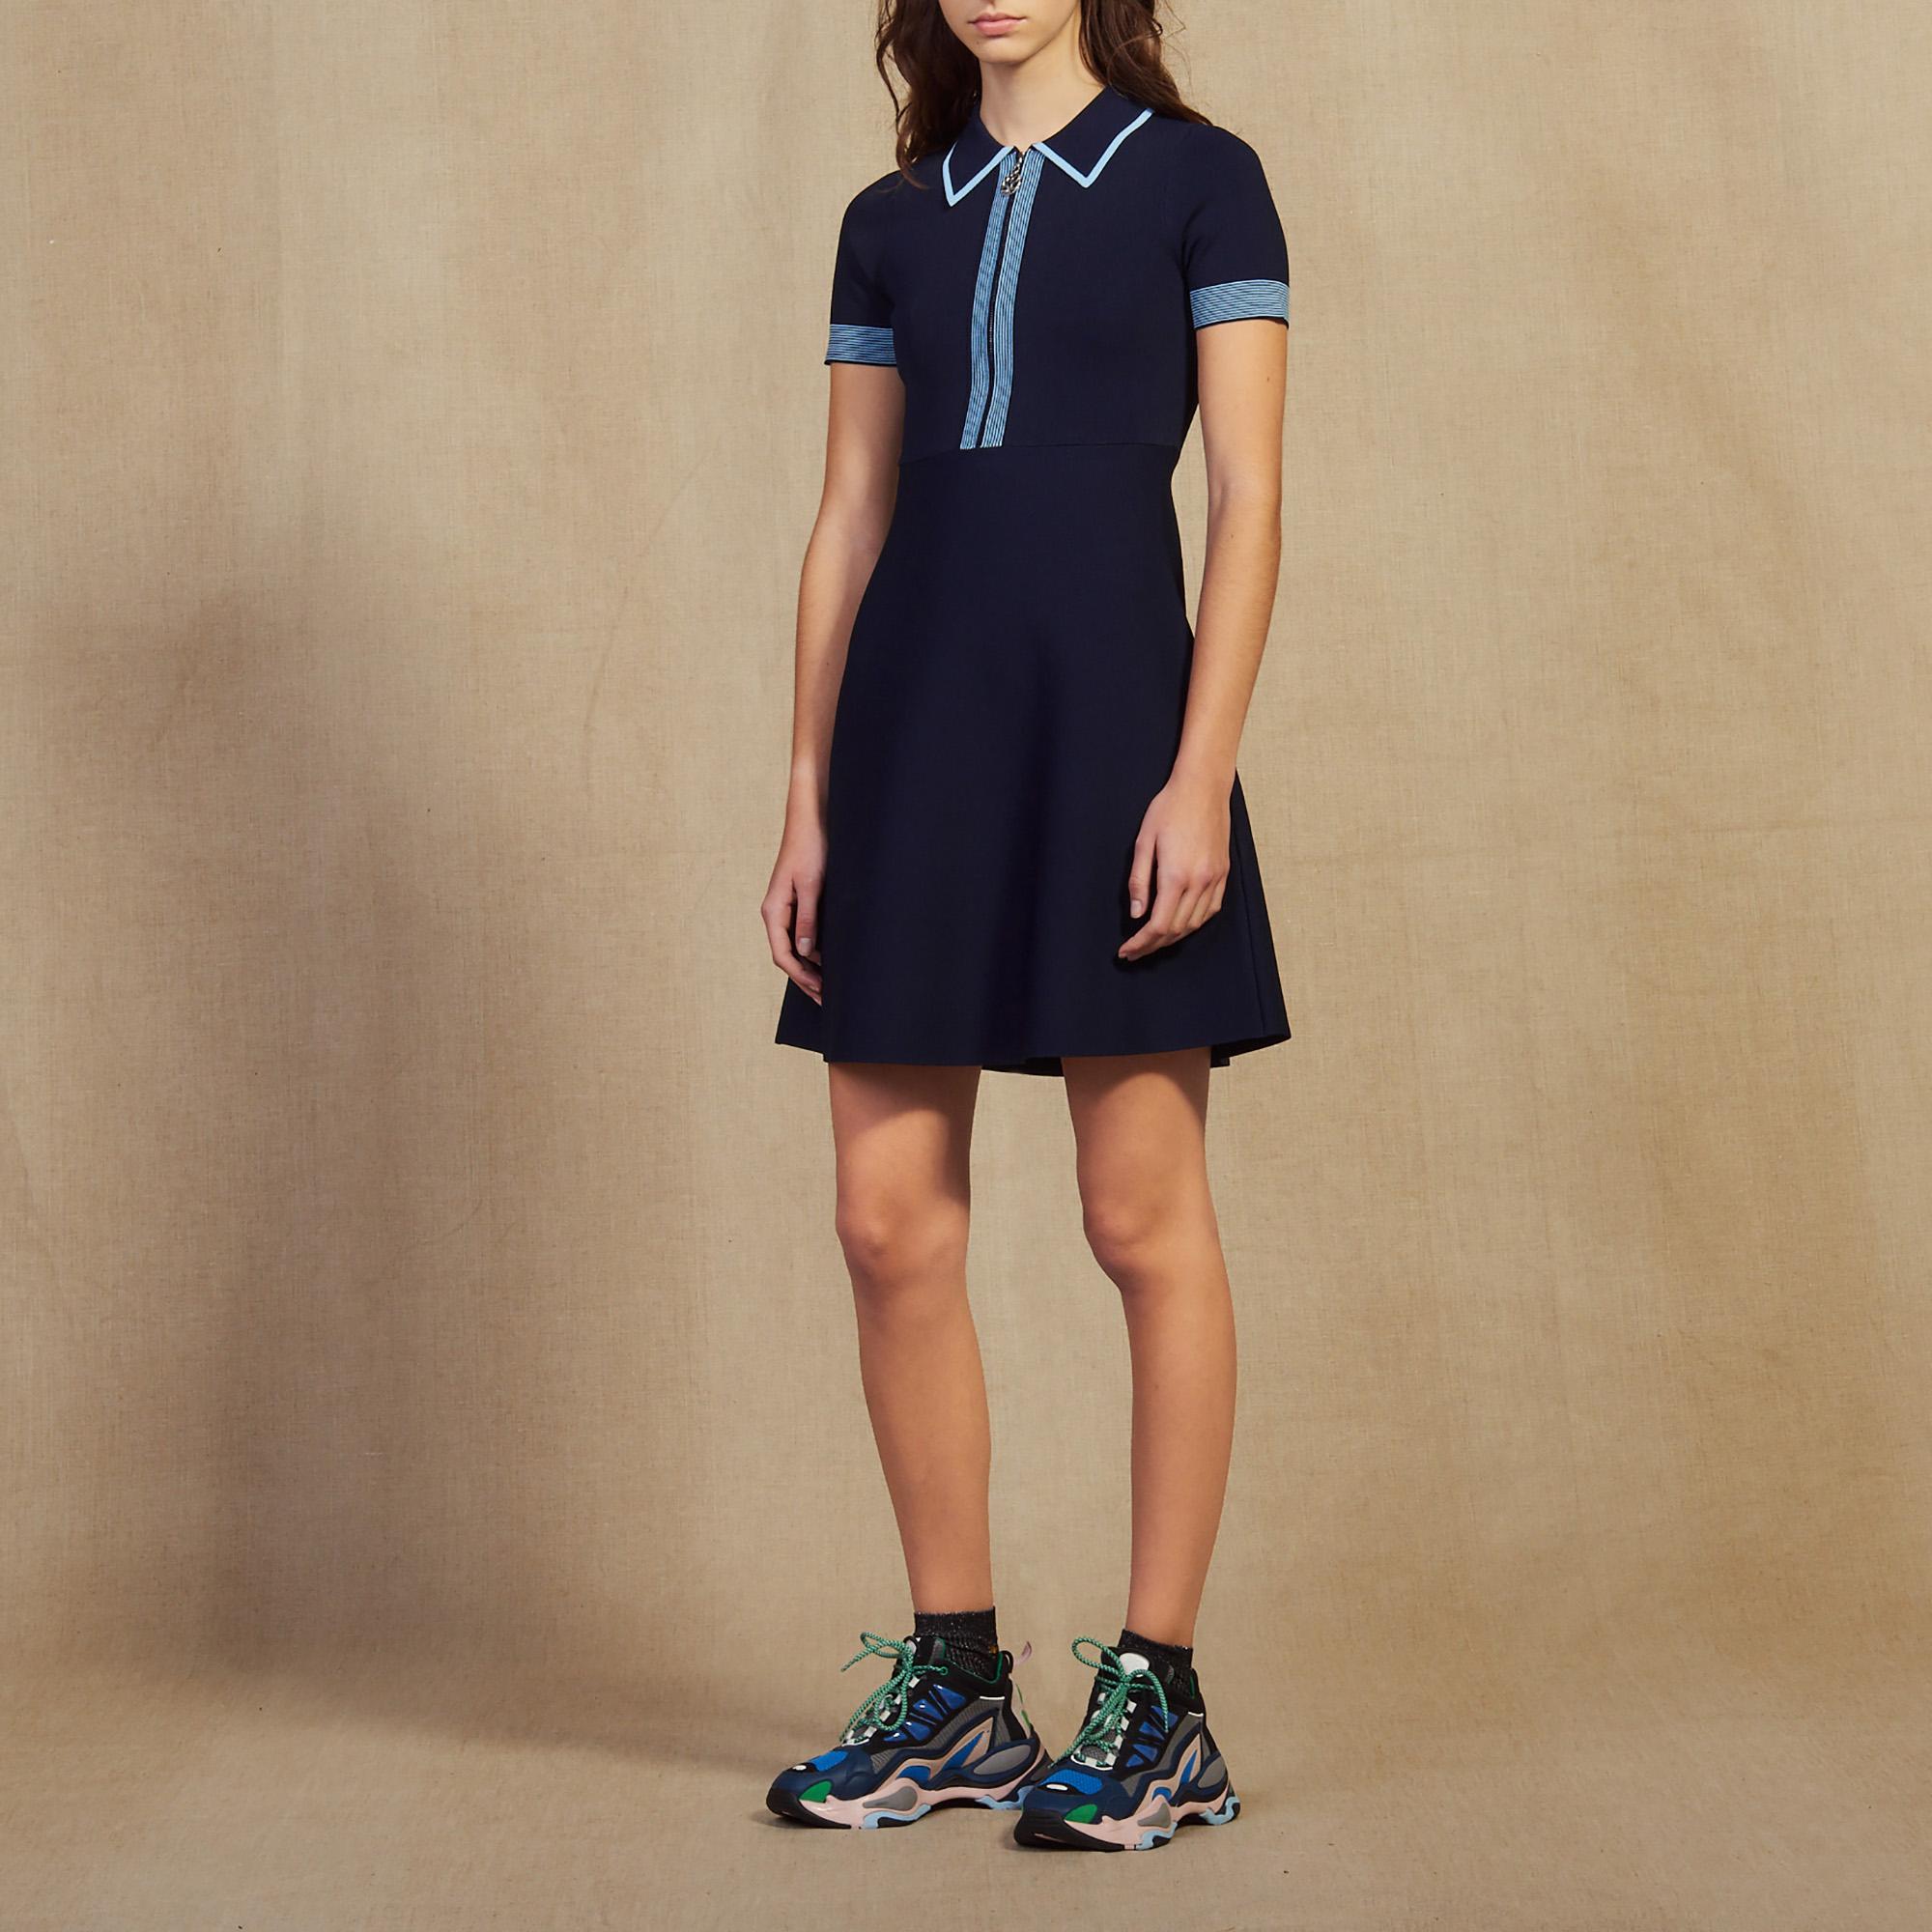 07ad893ea Knit Polo Dress   Dresses color Navy Blue ...